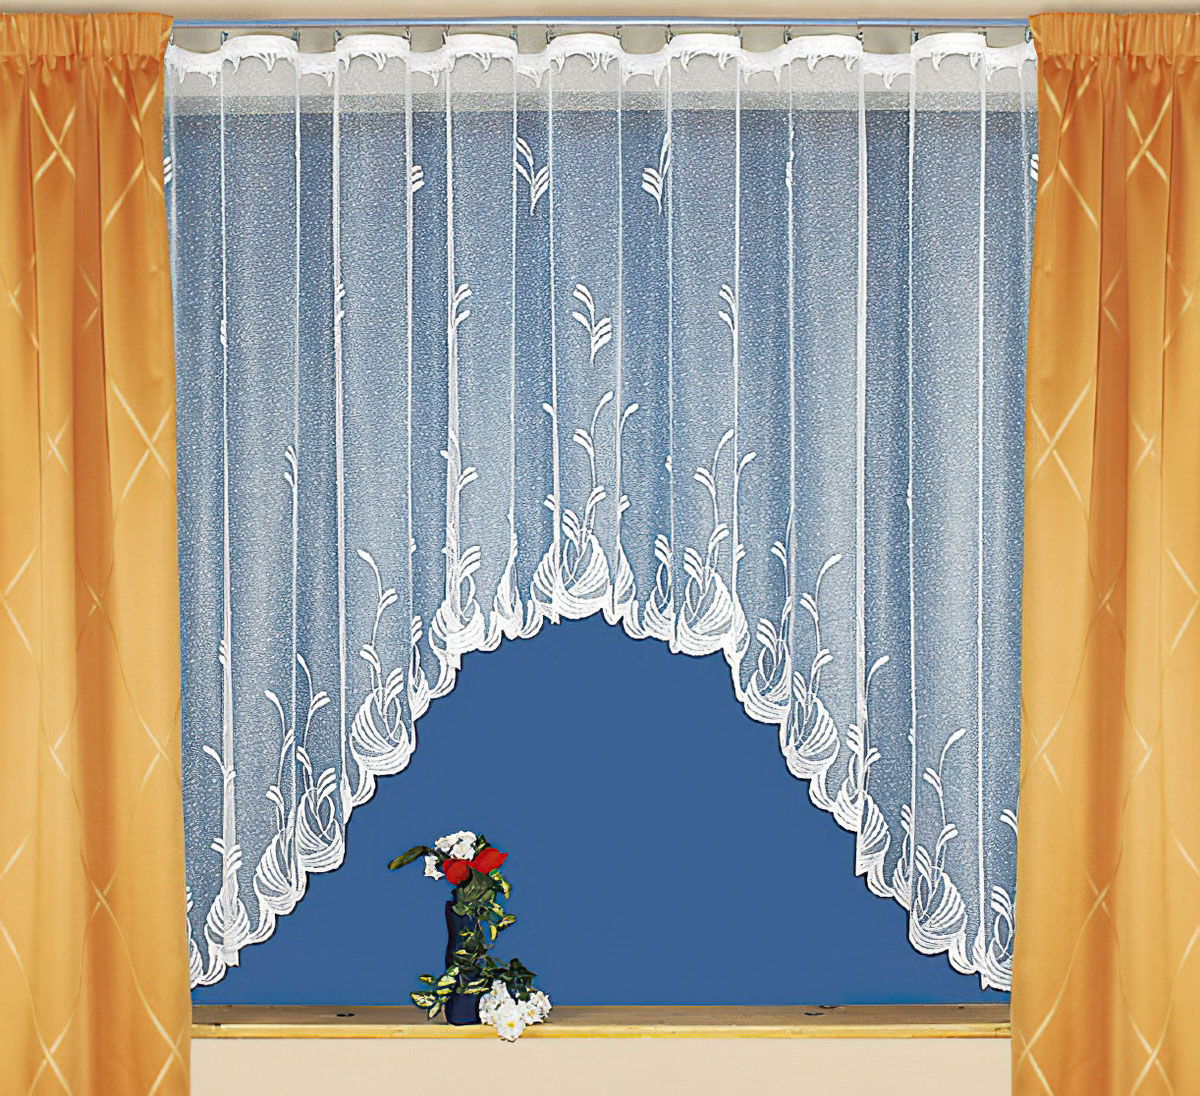 Tylex kusová záclona oblouková MARGOT jednobarevná bílá, v.140 cm x š.230 cm (na okno)